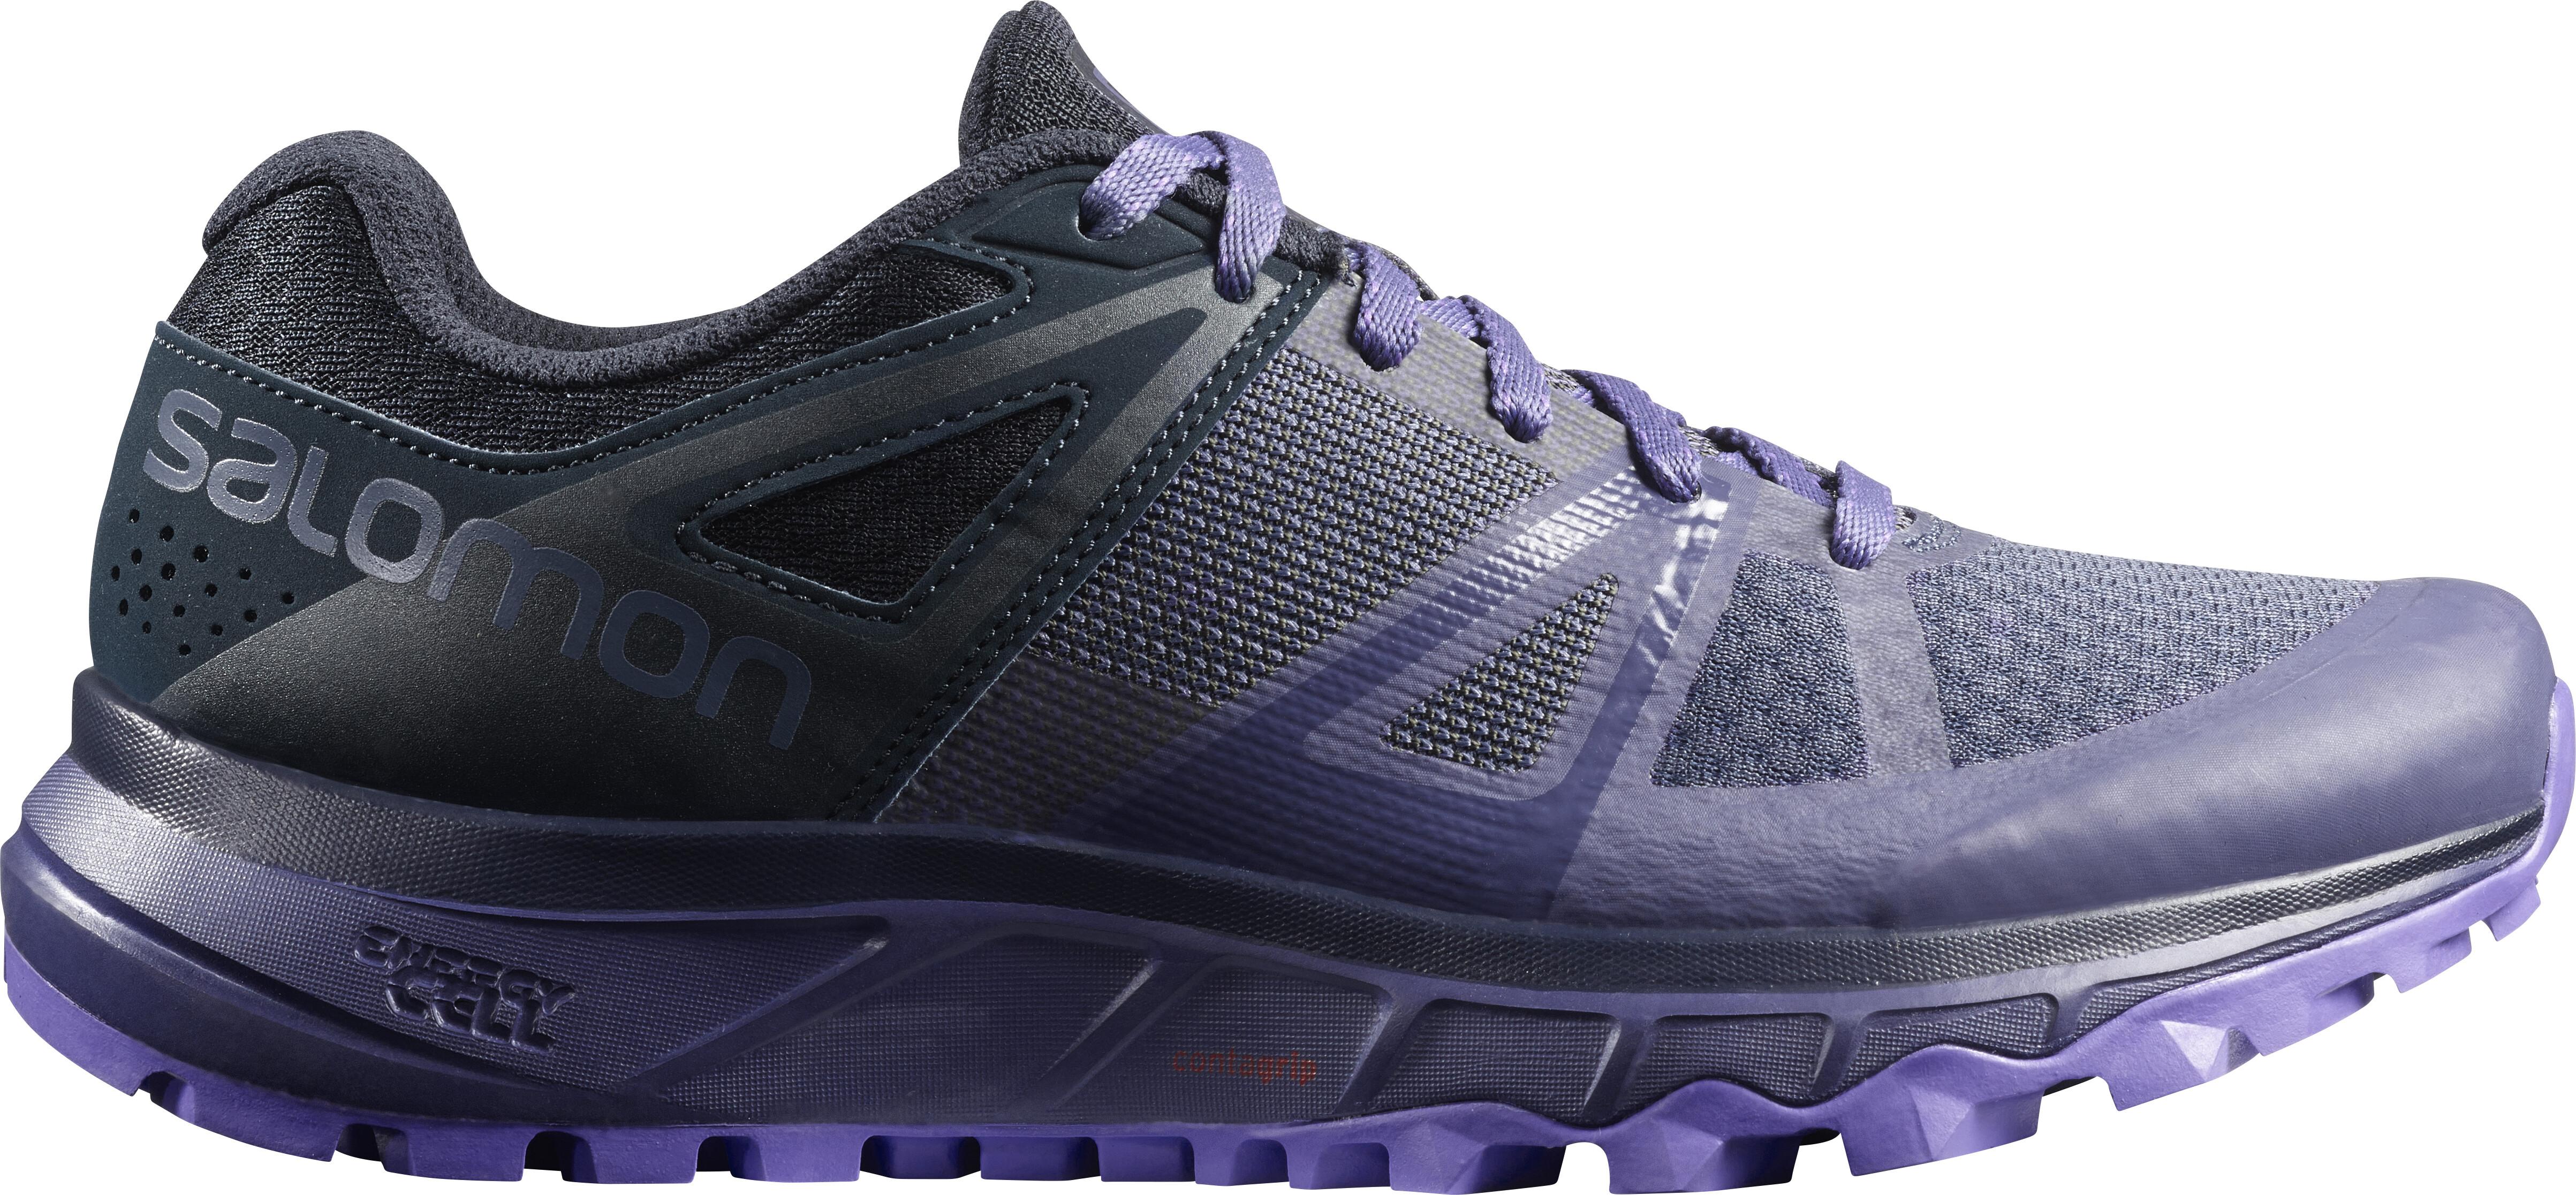 e72aa2dc5c4 Salomon Trailster - Zapatillas running Mujer - gris